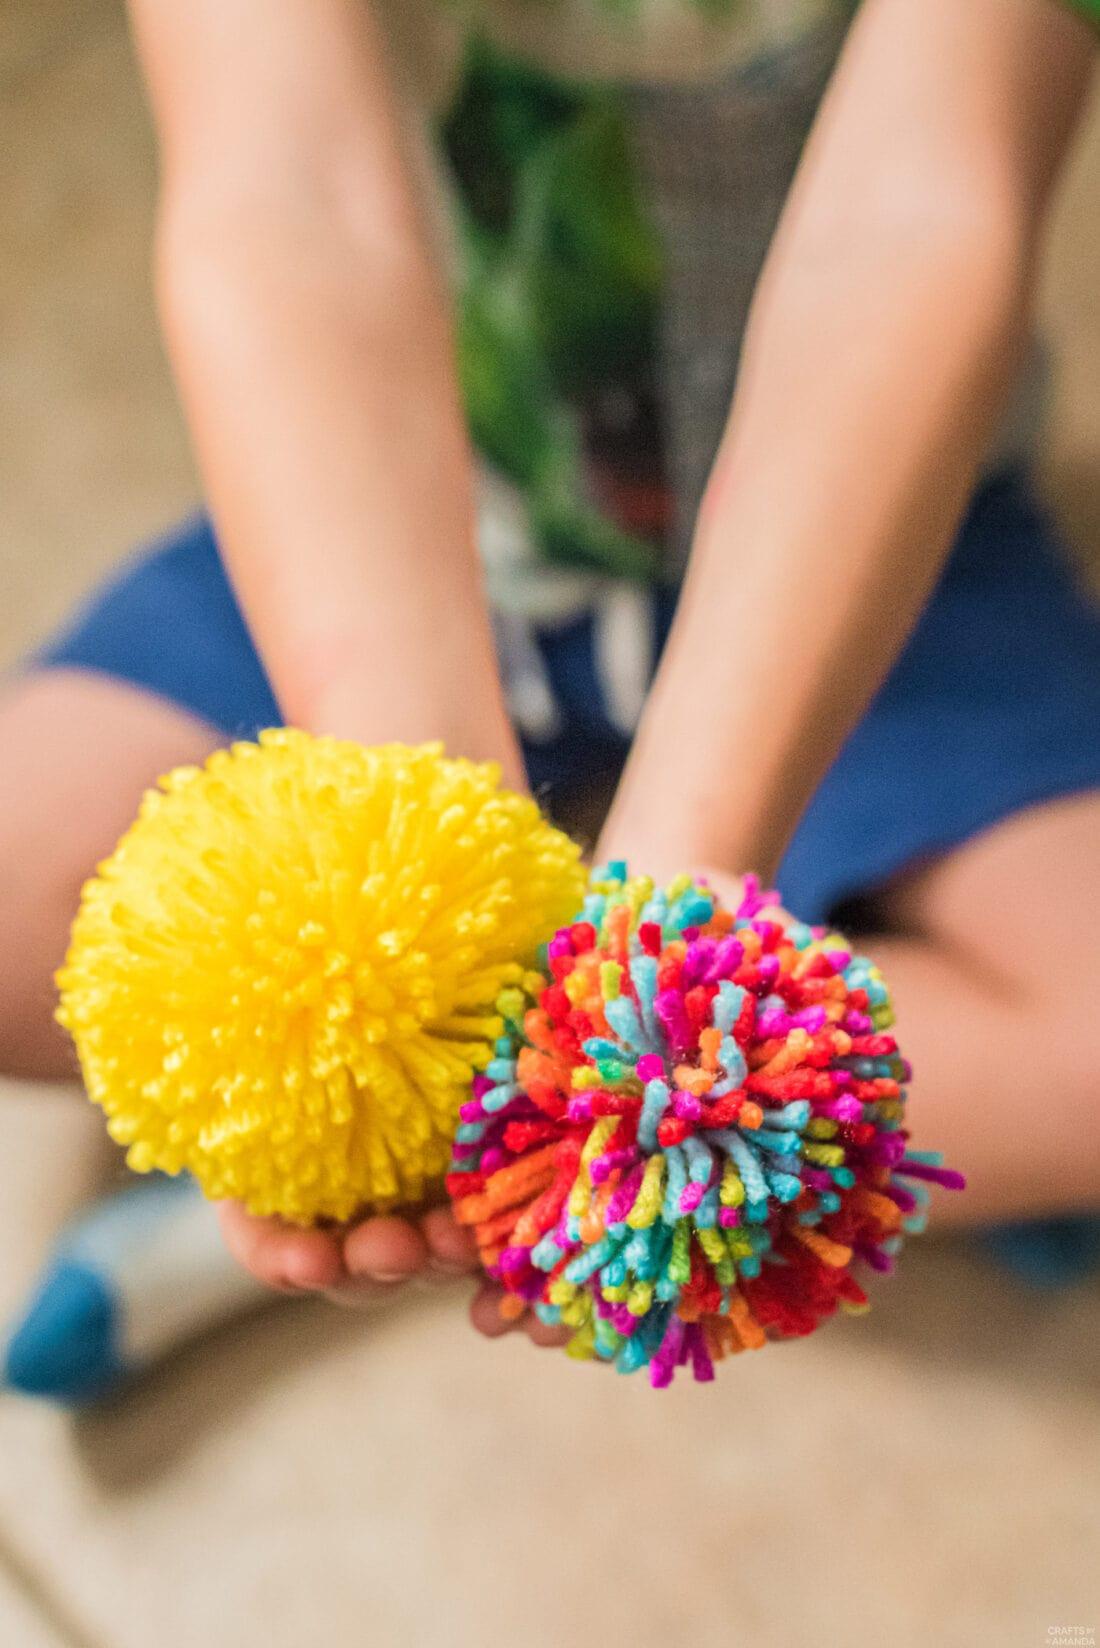 child holding two homemade yarn pom poms